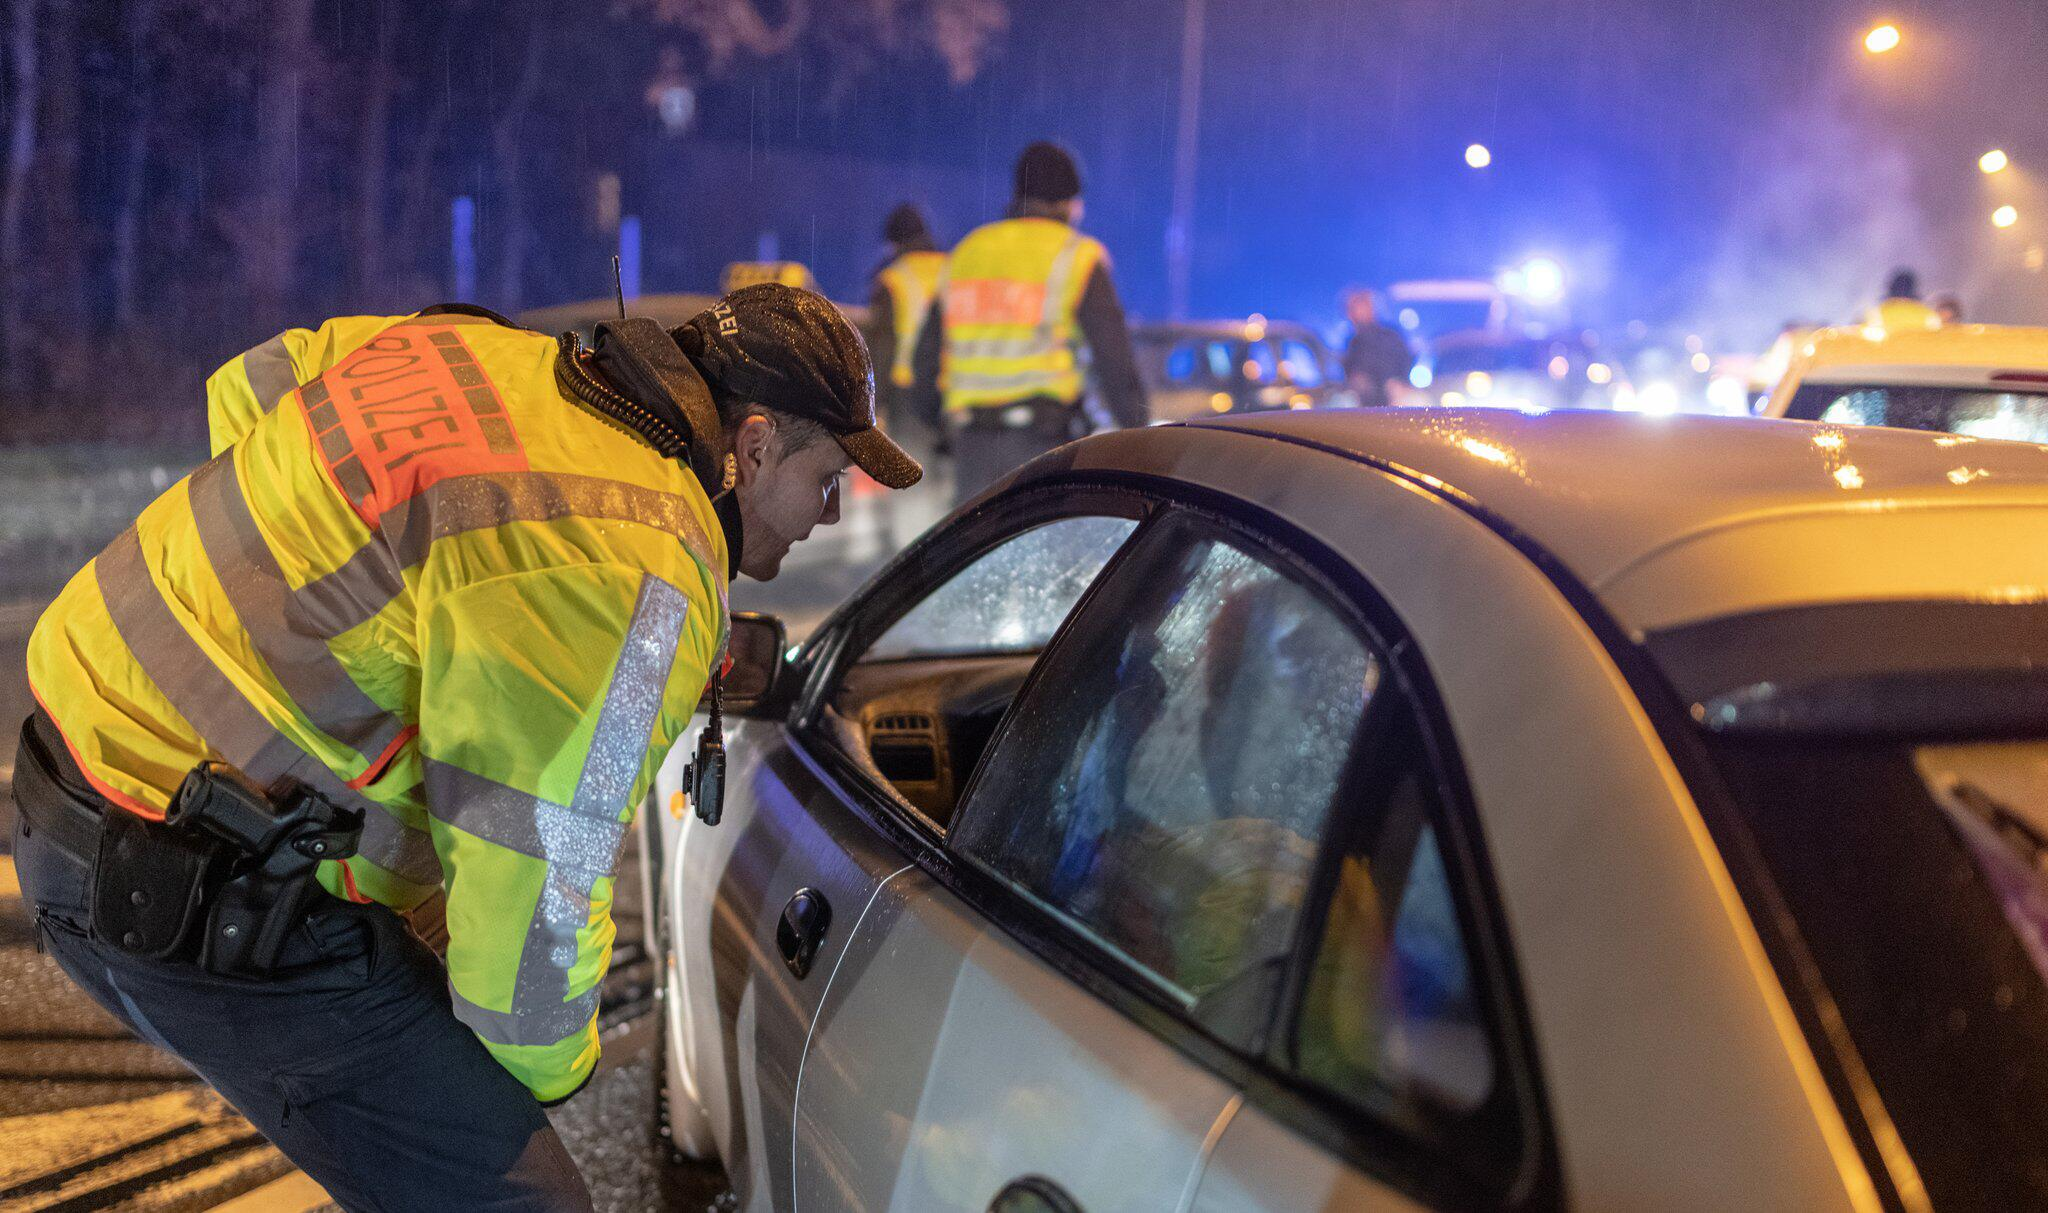 Bild zu The police strengthens its presence in Freiburg